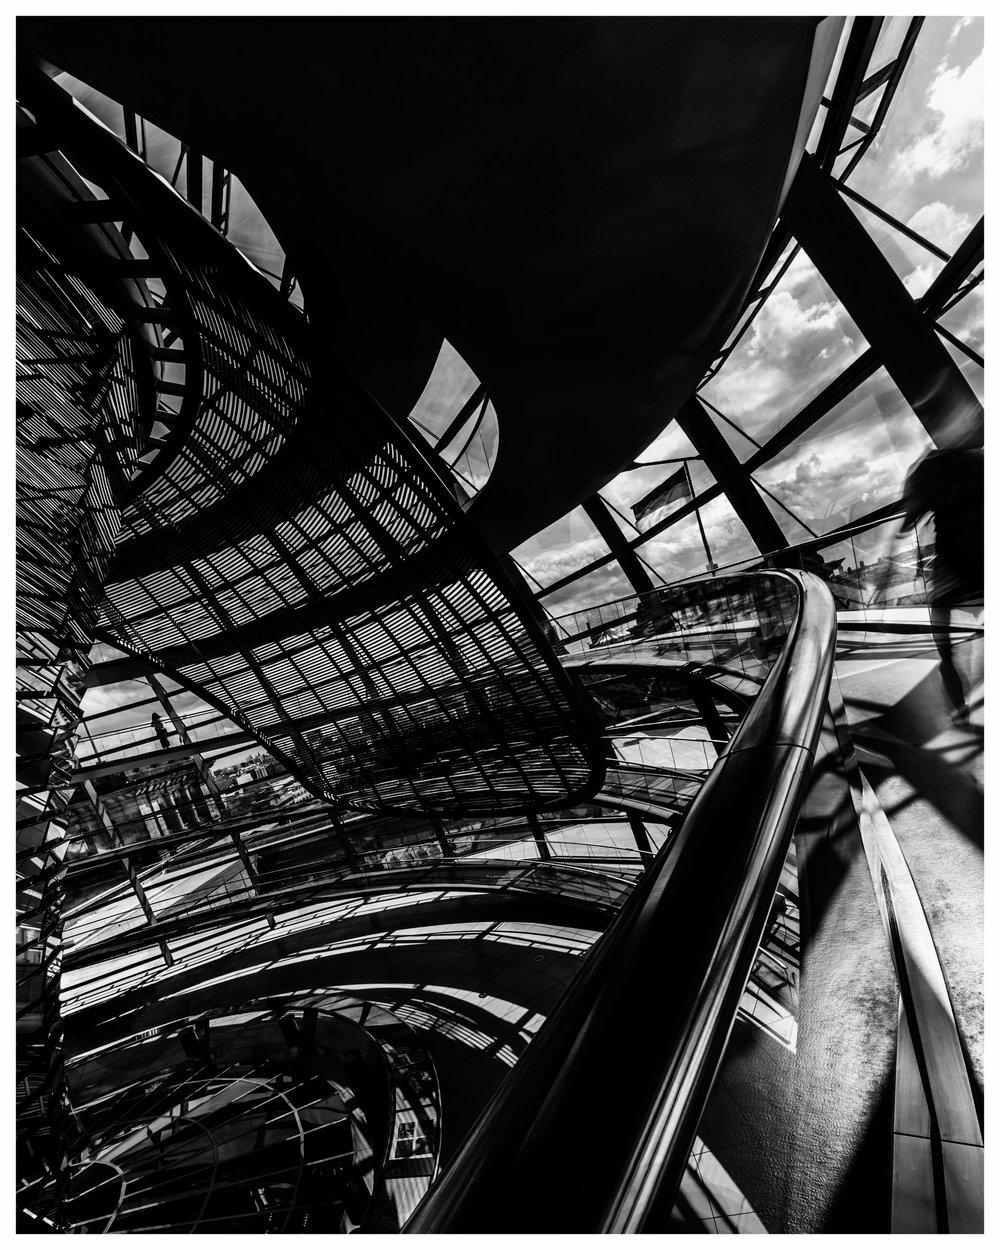 05_Bundestag2.jpg